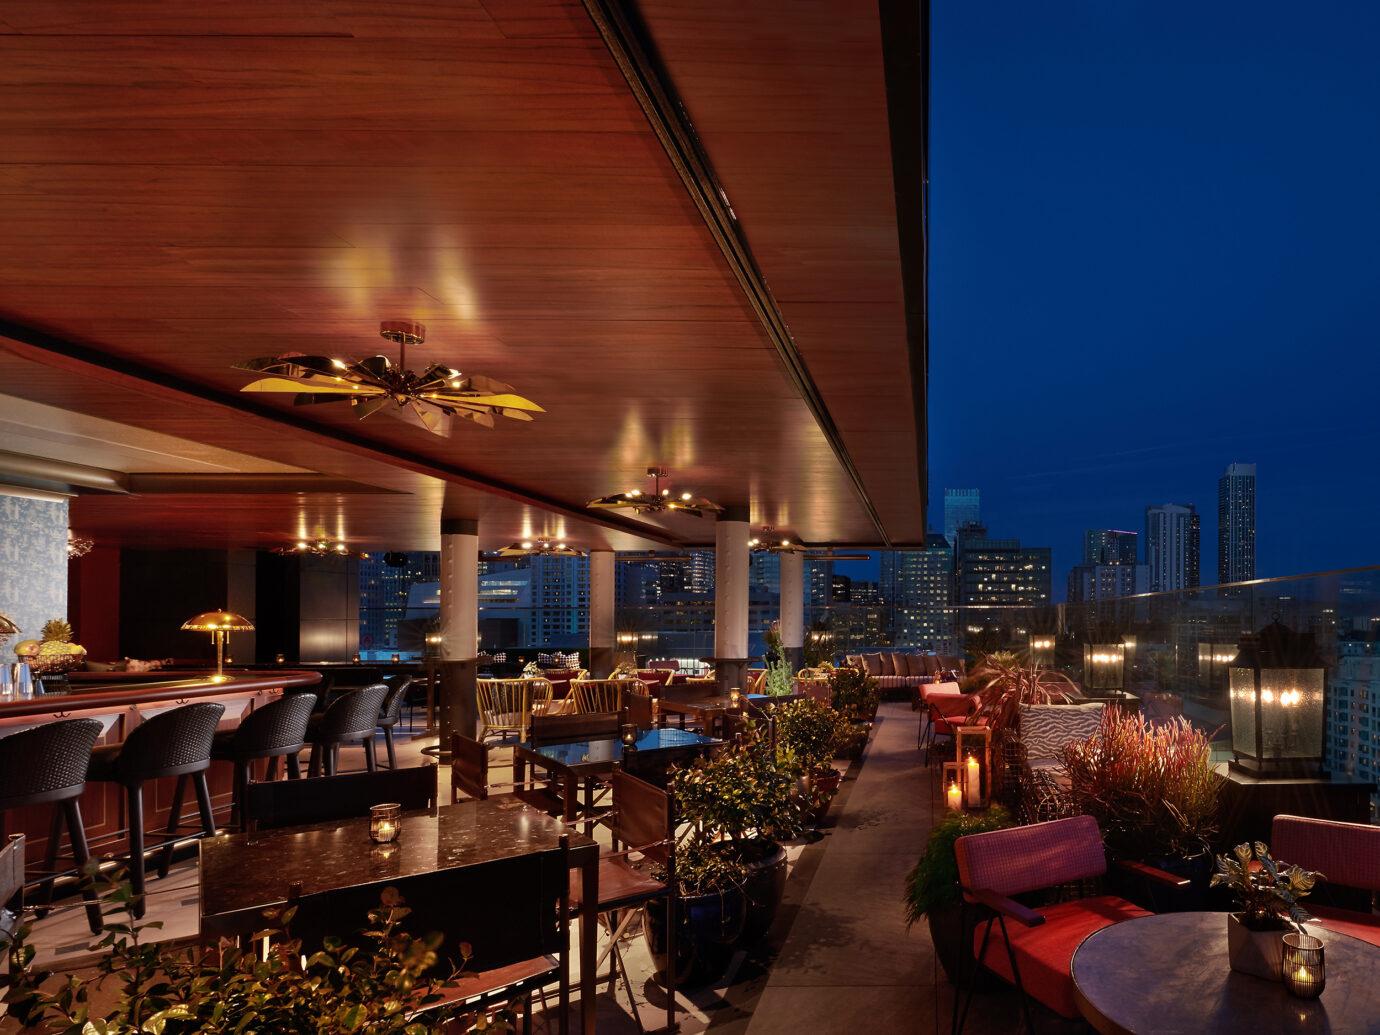 Everdeen rooftop bar at the Virgin Hotel in San Francisco